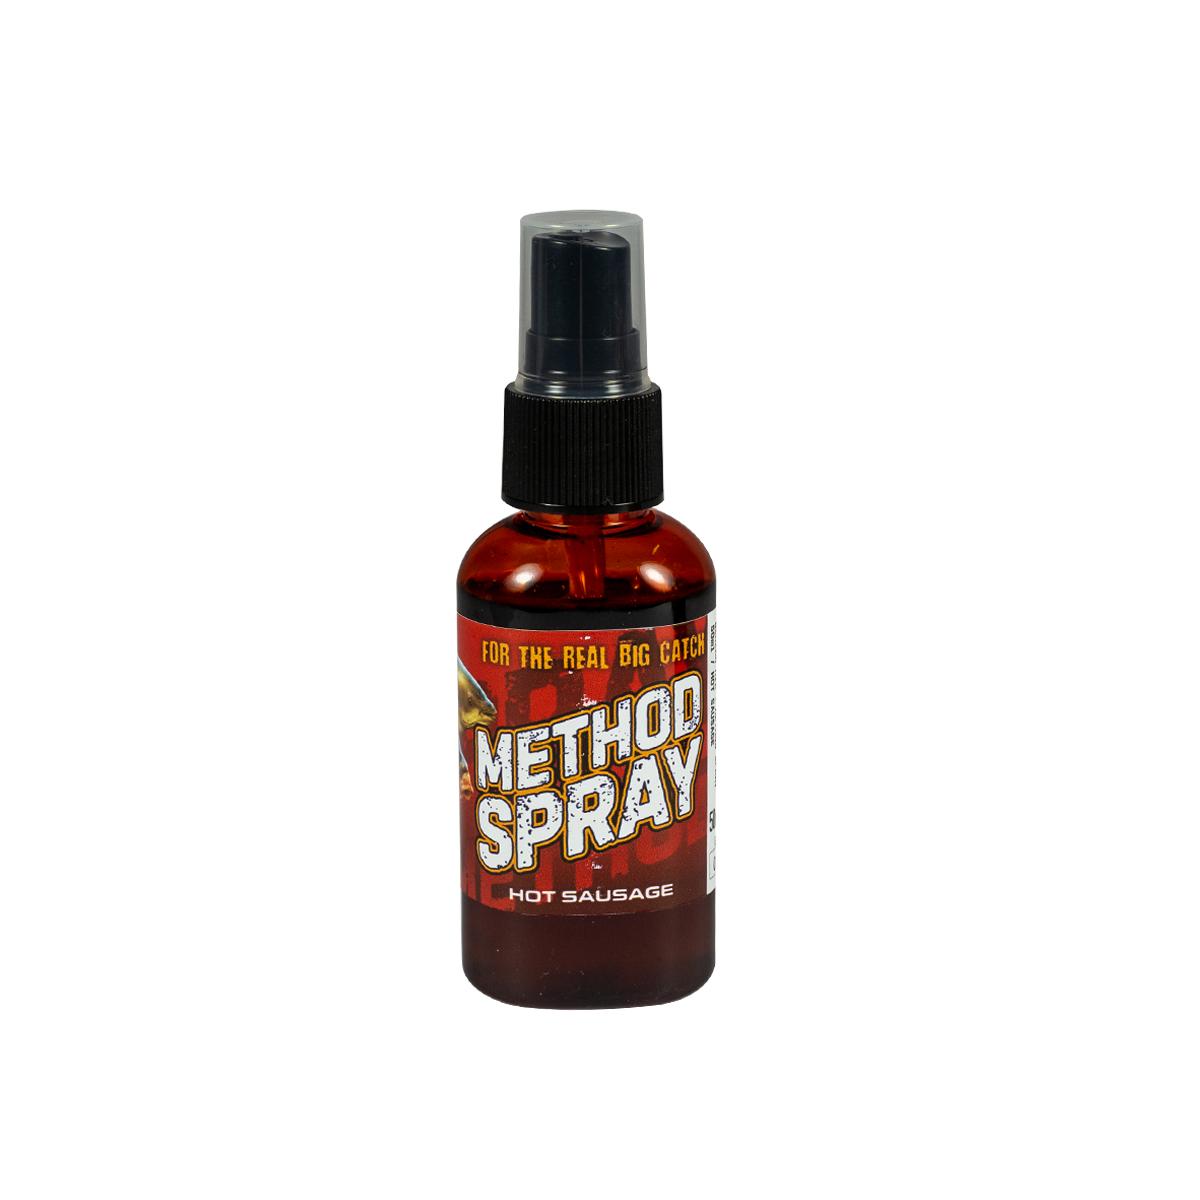 BENZAR MIX Method Spray - ŠTIPLAVÁ KLOBÁSA (50ml)